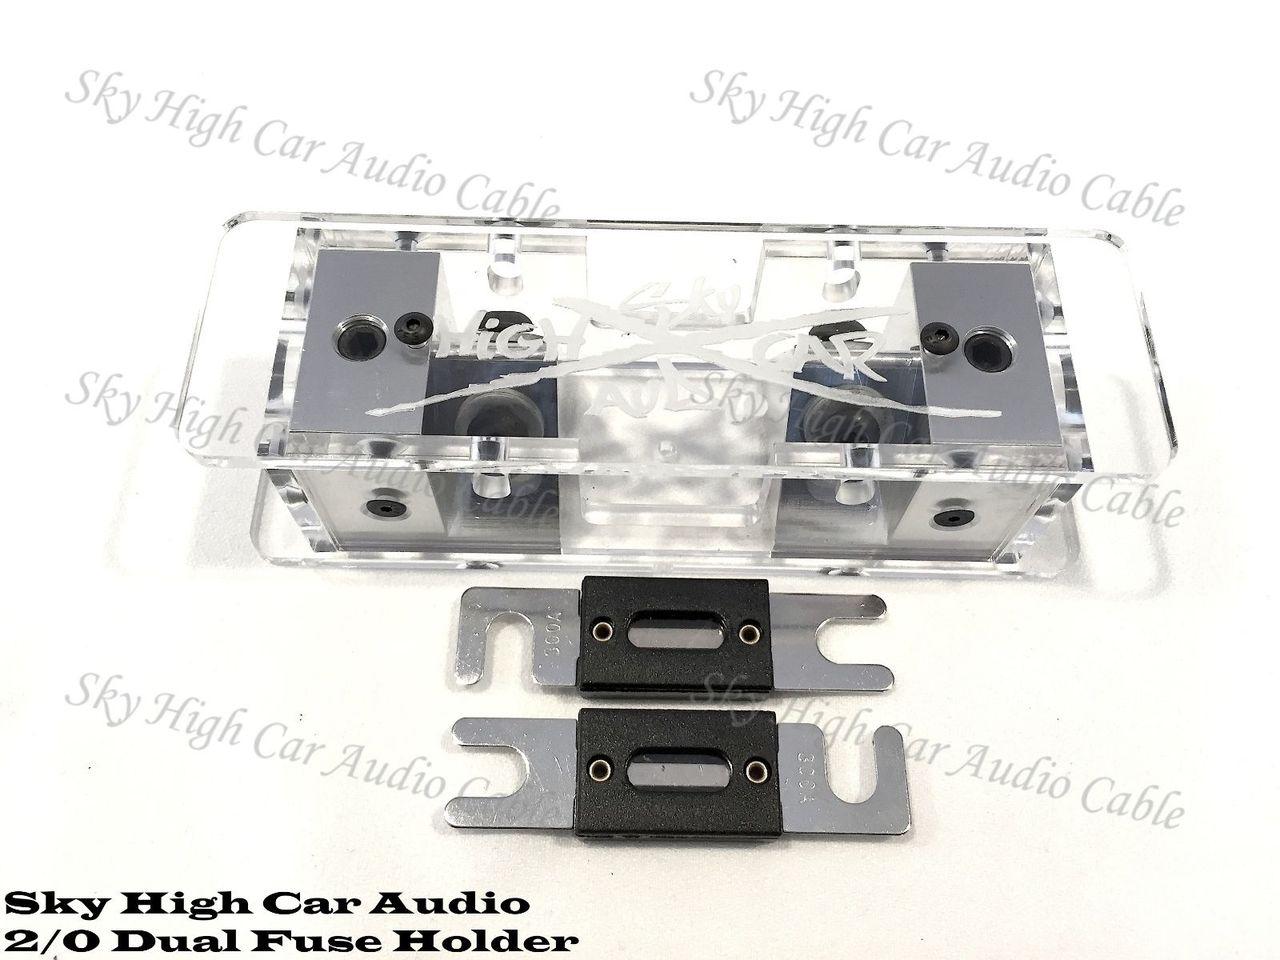 Sky High Car Audio 2/0 ANL Fuse Holder - Set Screw